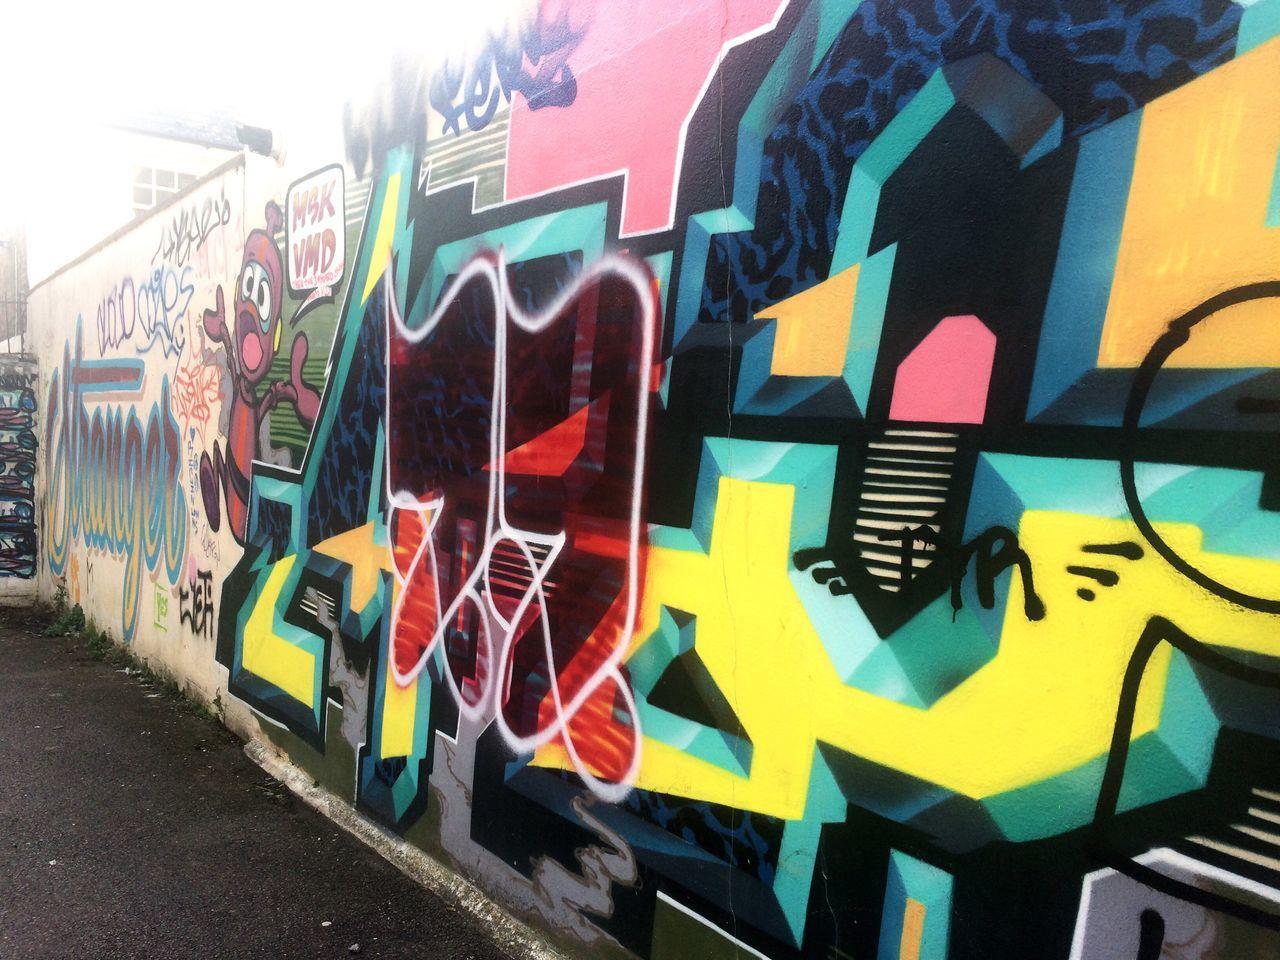 graffiti, train - vehicle, rail transportation, transportation, multi colored, outdoors, no people, public transportation, day, stationary, sky